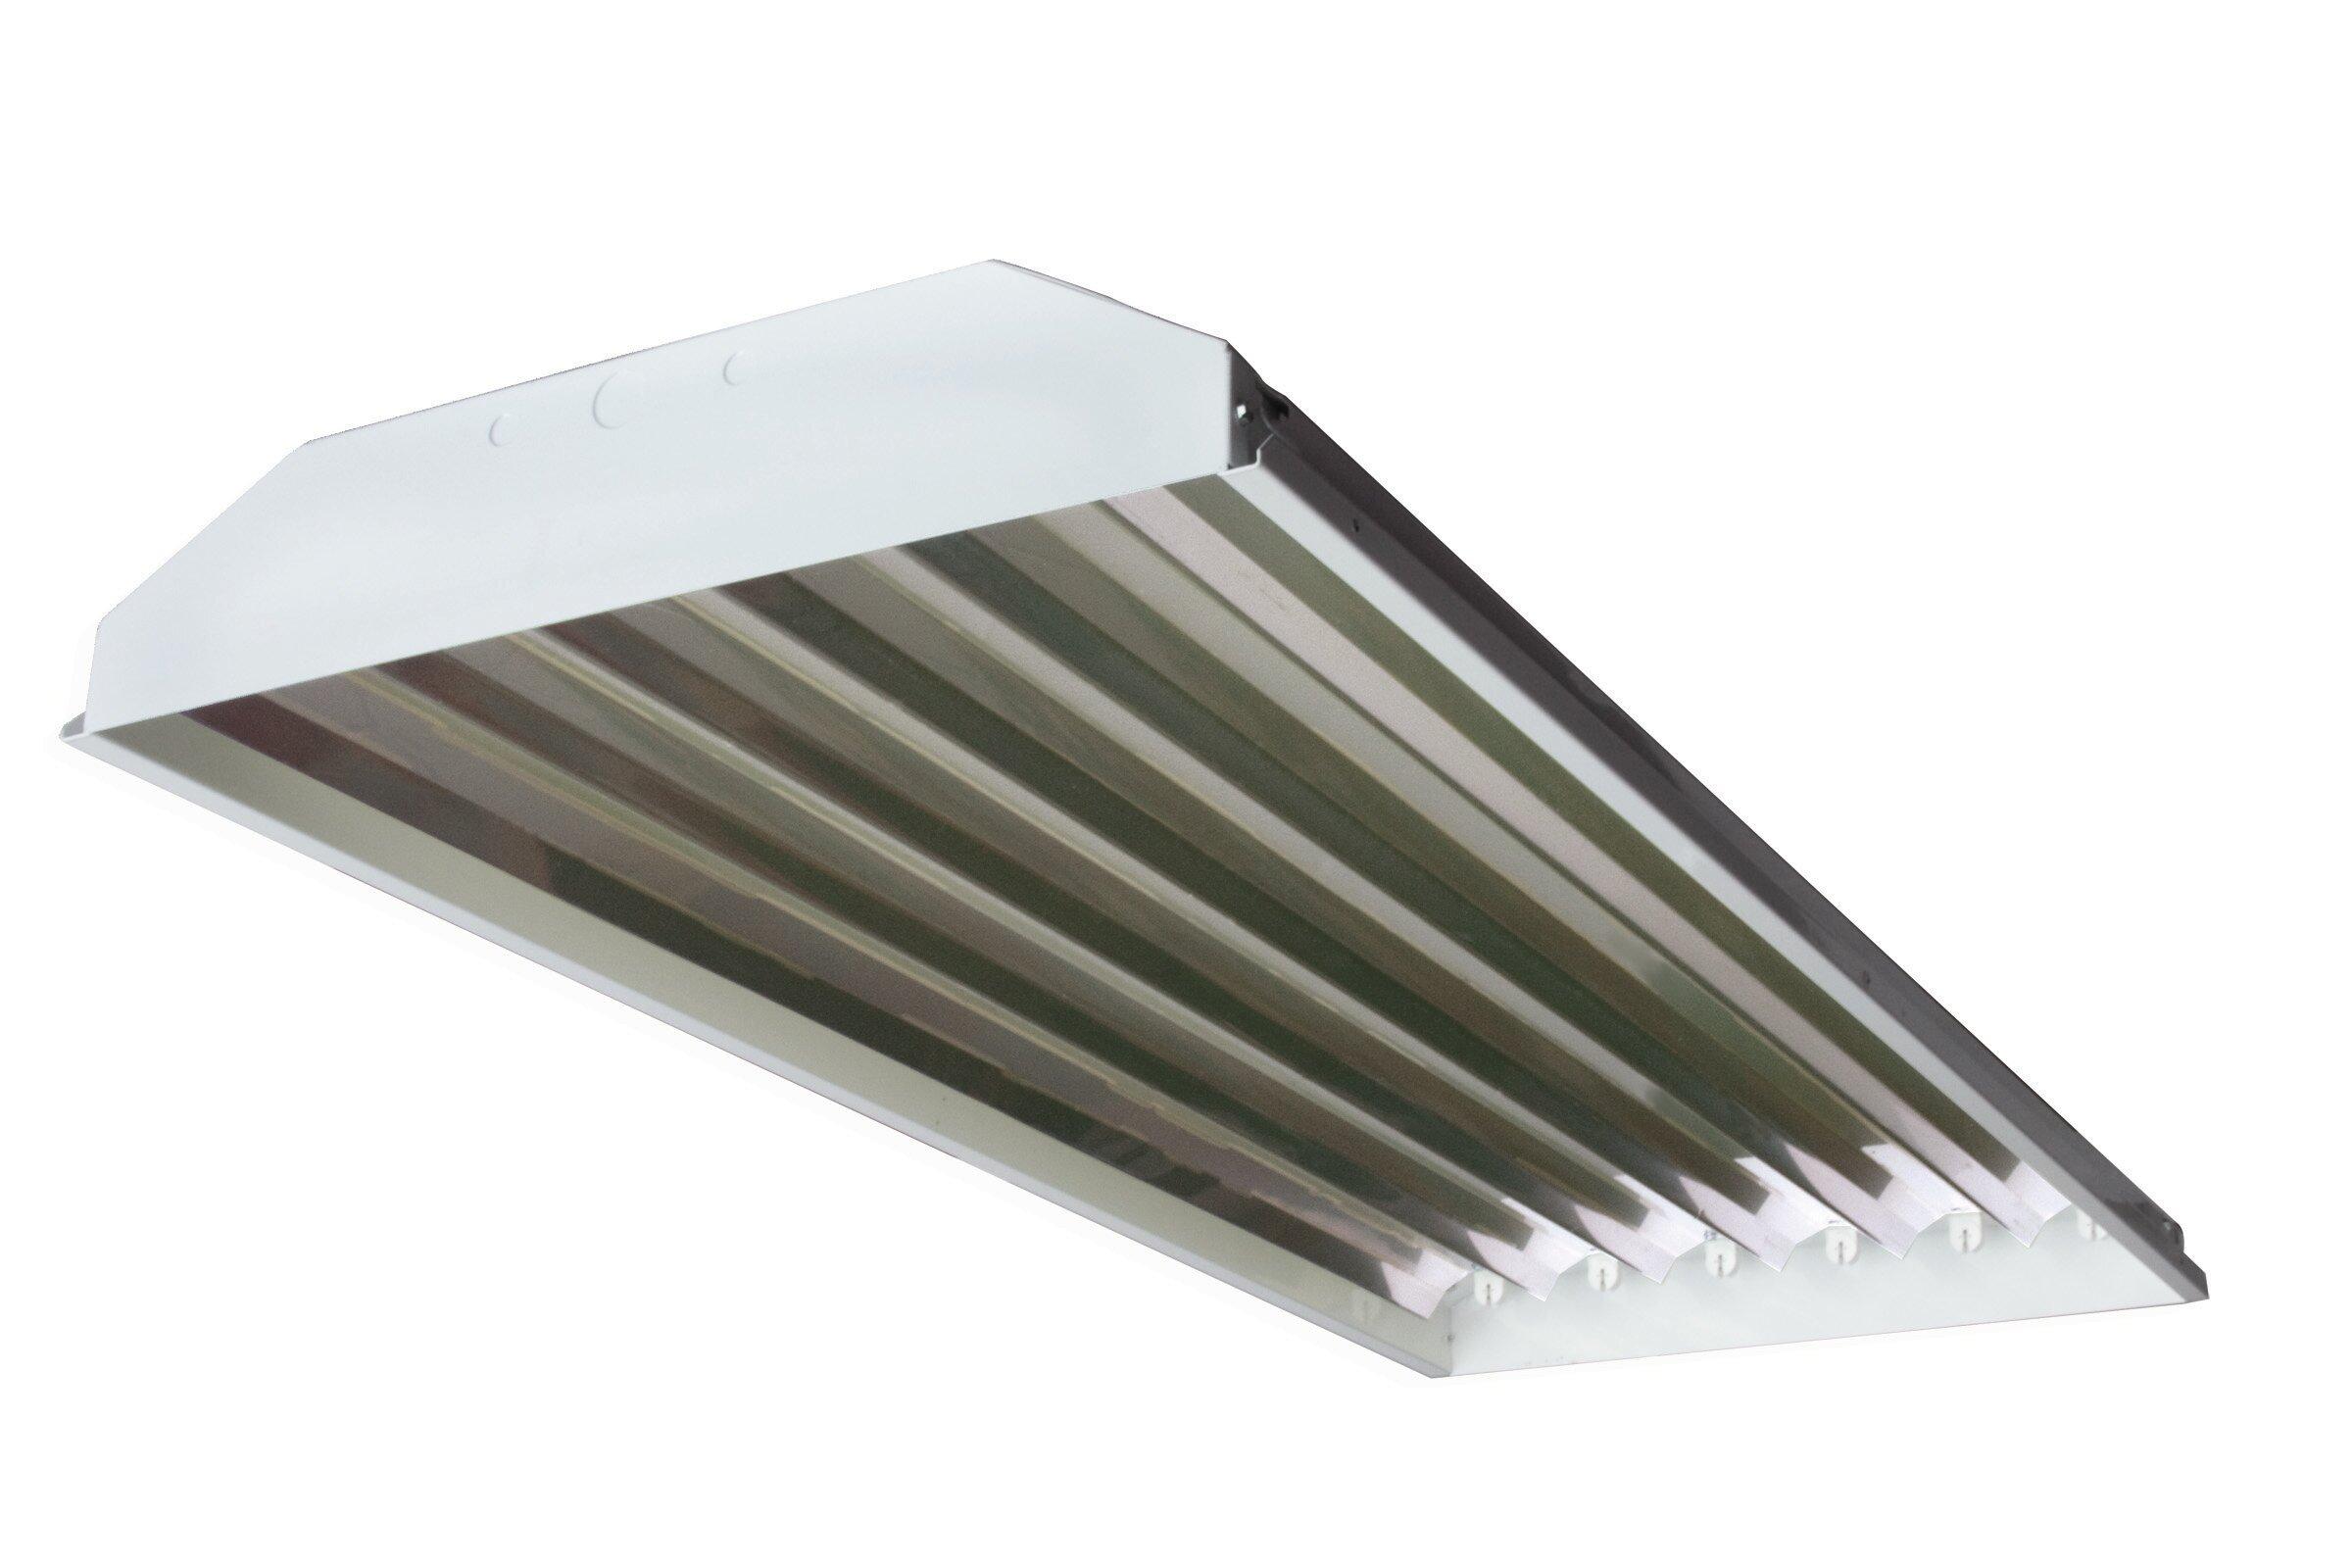 Shop Light 4-Light Grey Fluorescent Detachable Wire Guard 12 in Reflector